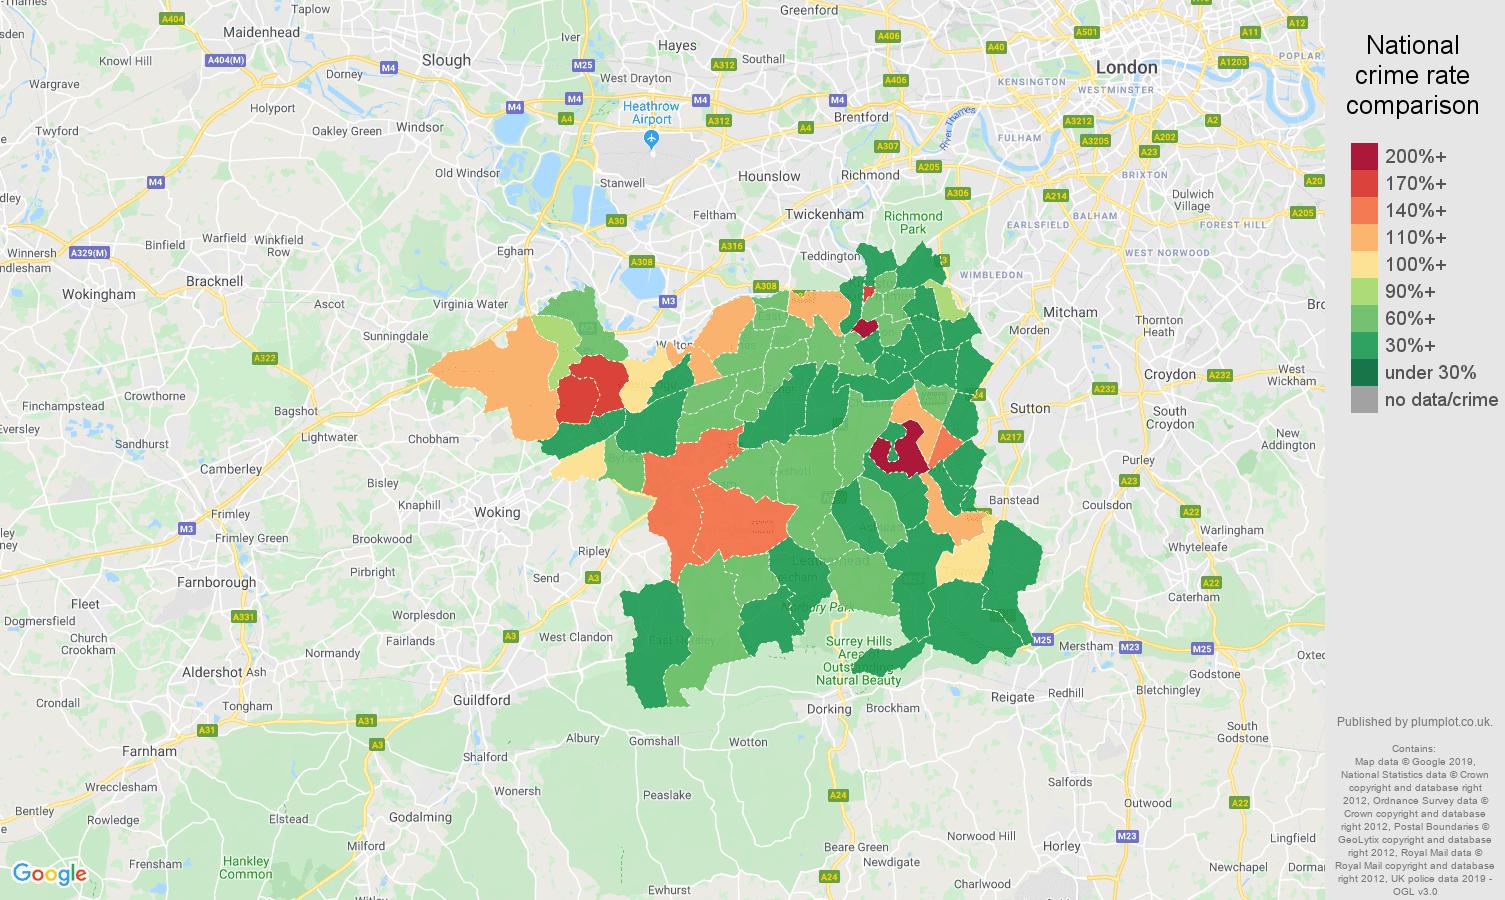 Kingston upon Thames public order crime rate comparison map